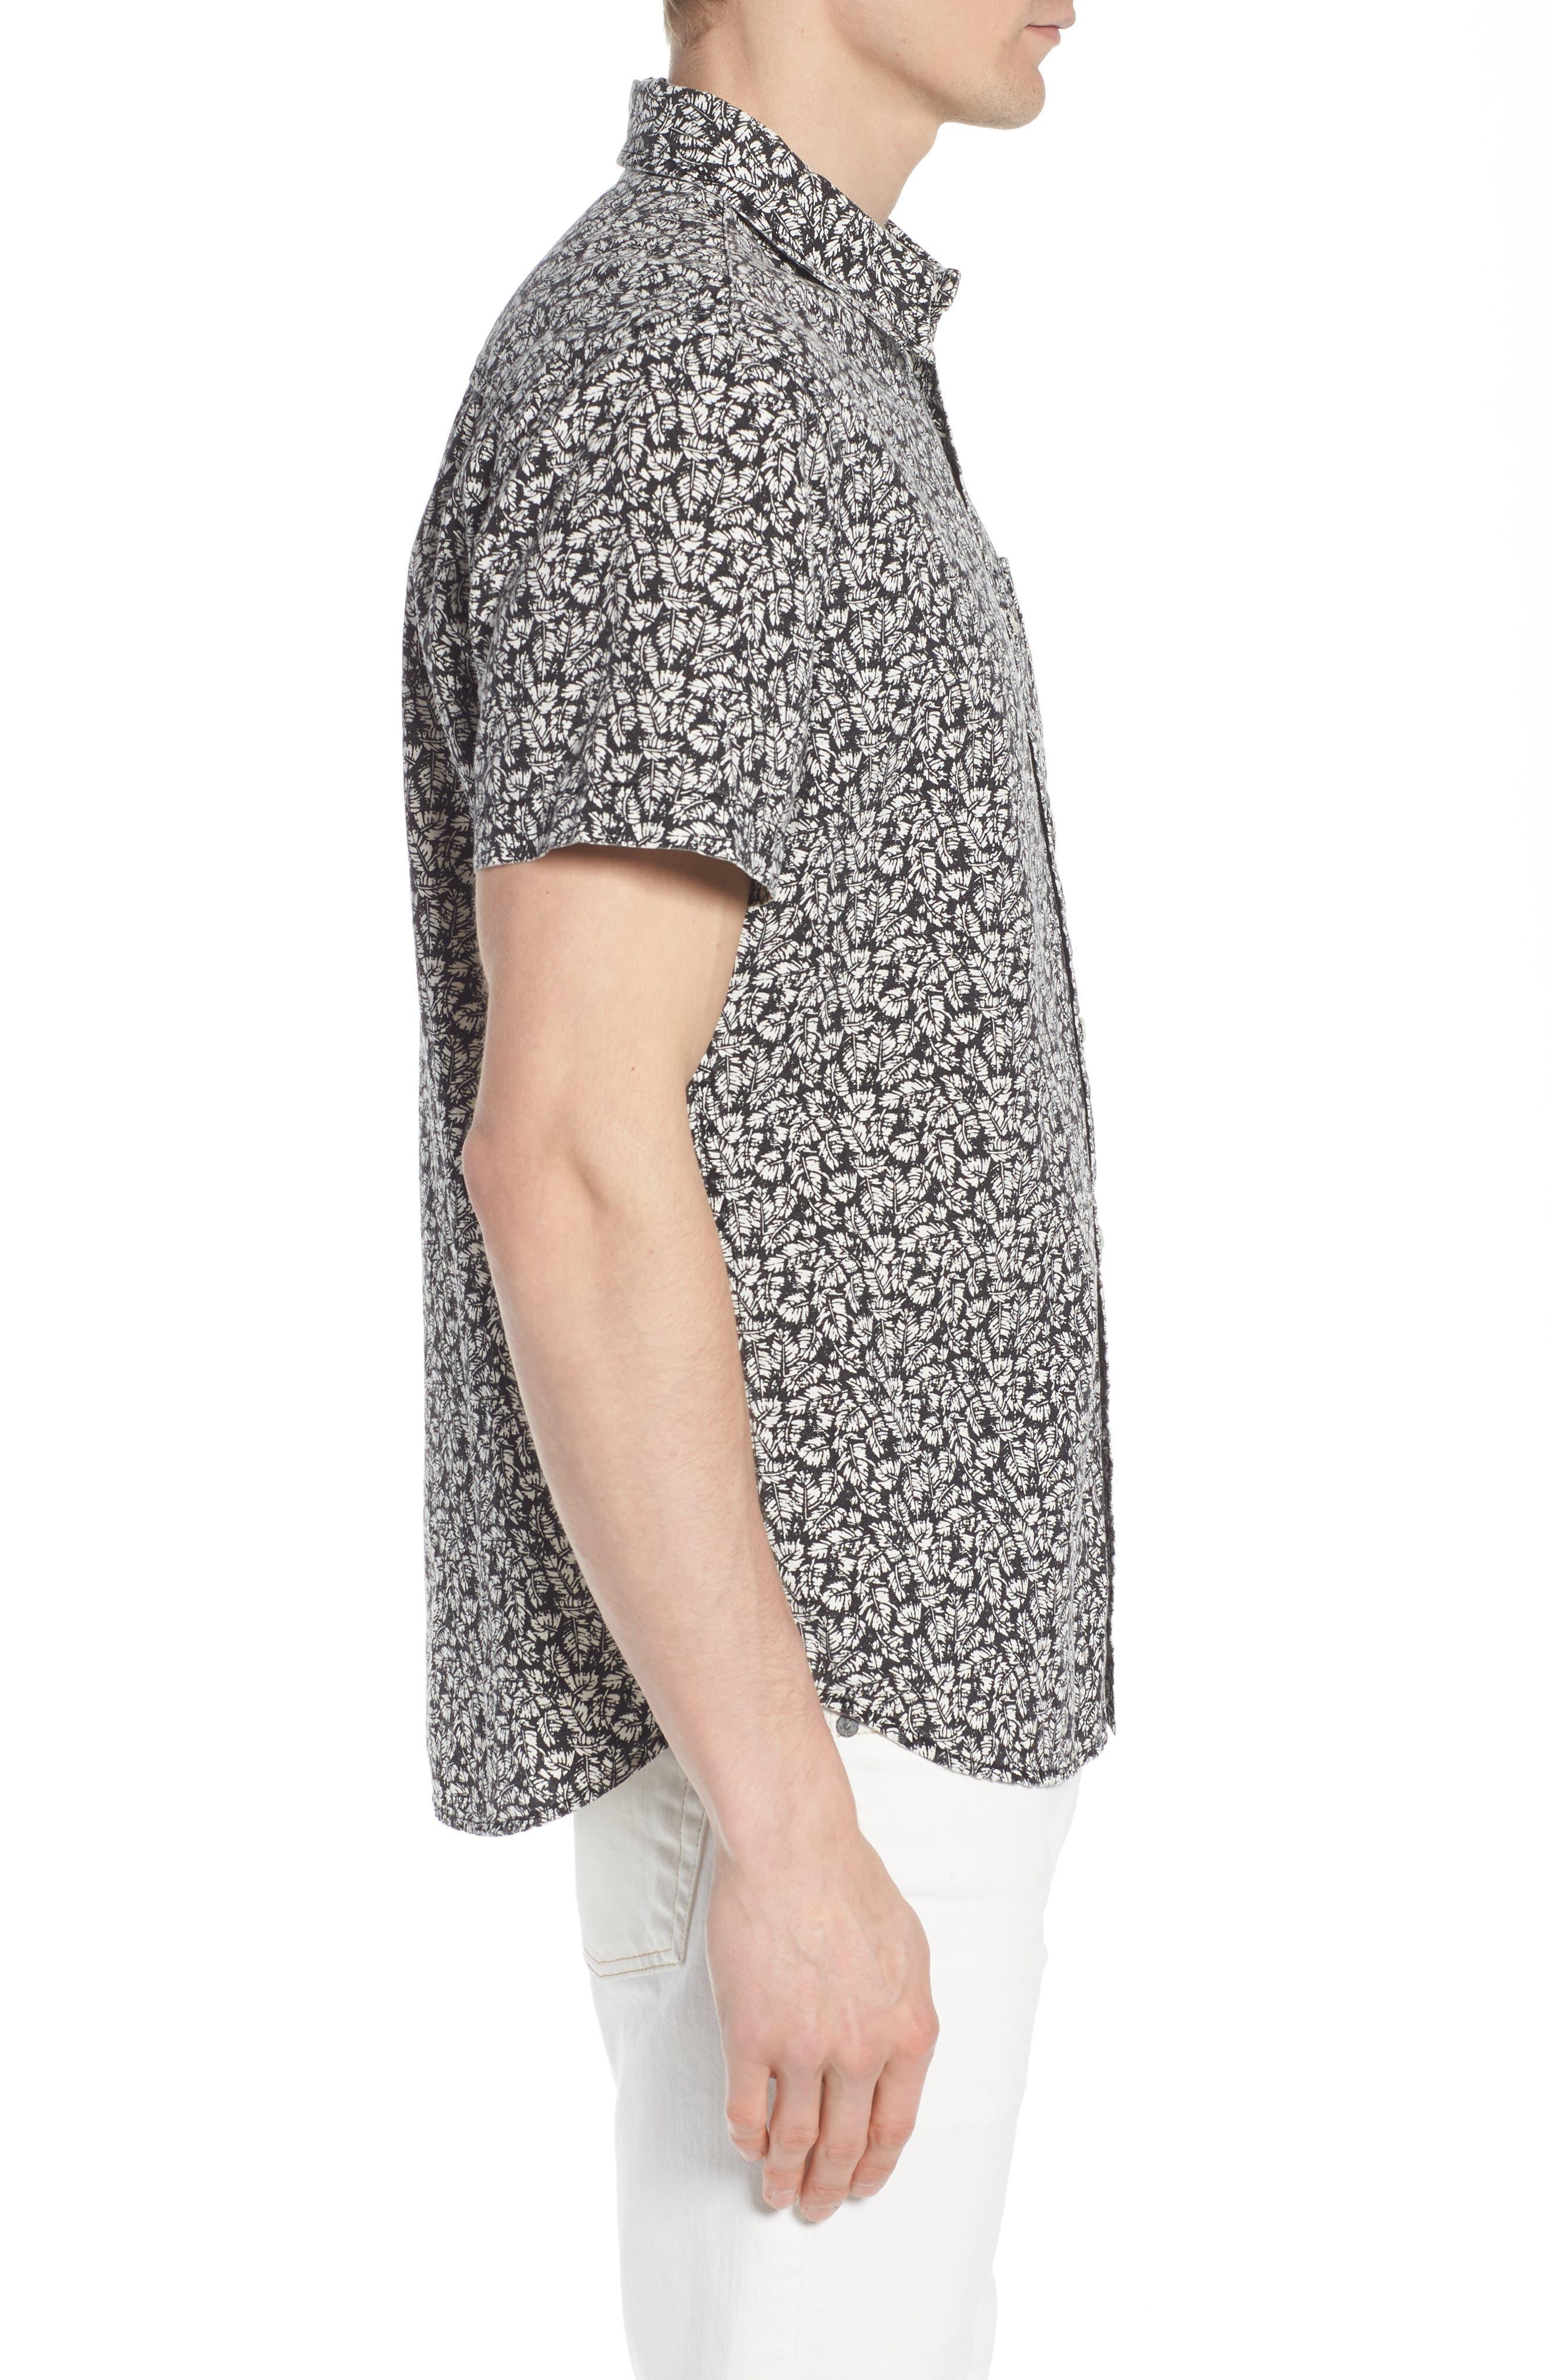 Nash Regular Fit Short Sleeve Sport Shirt,                             Alternate thumbnail 3, color,                             015